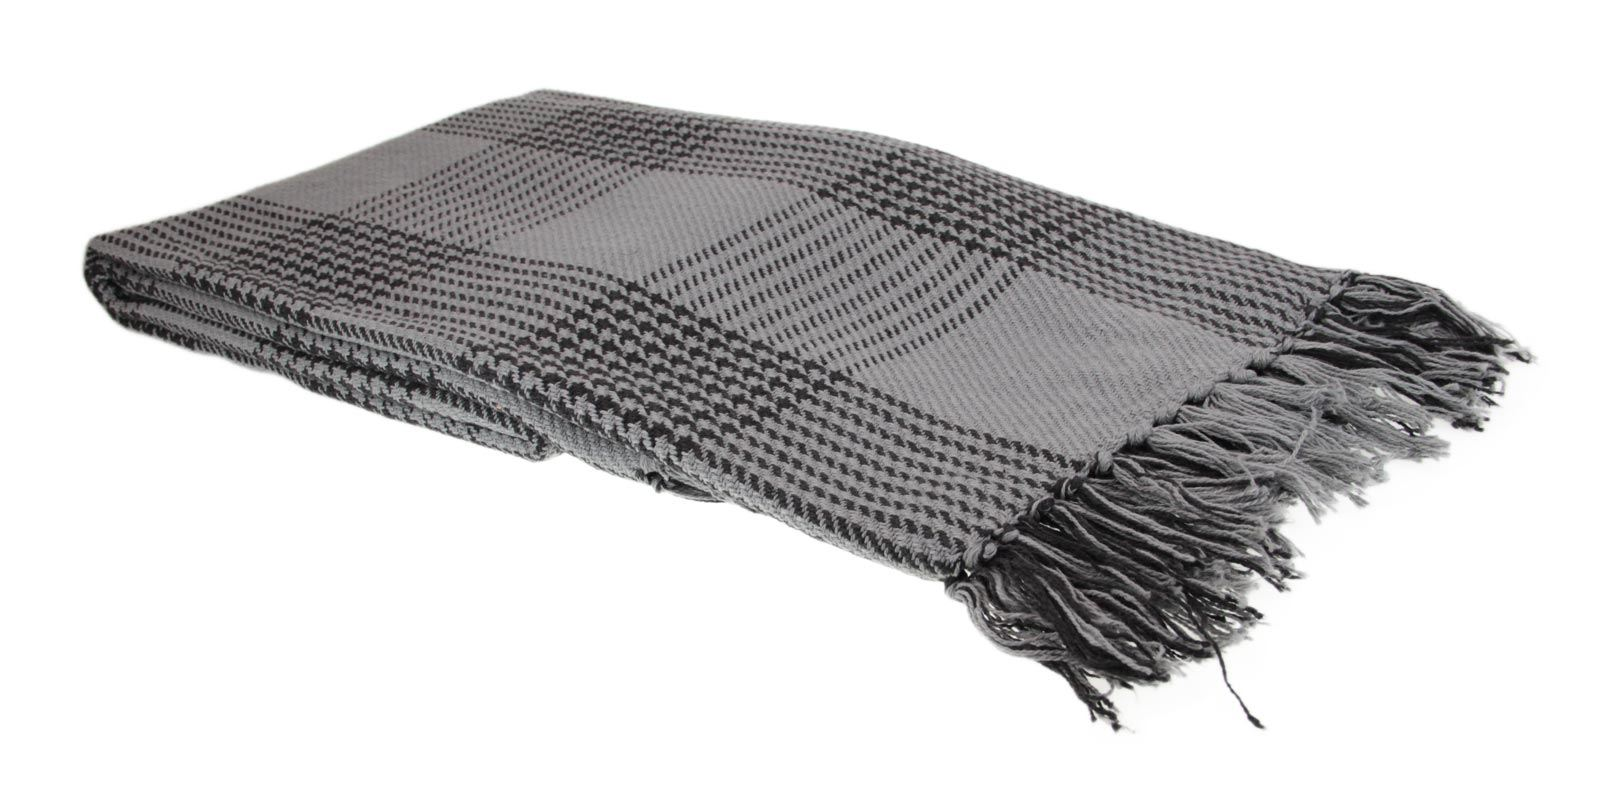 Super Soft Tartan Throw 100% Cotton Plaid Check Bedspread, Black Grey Natural